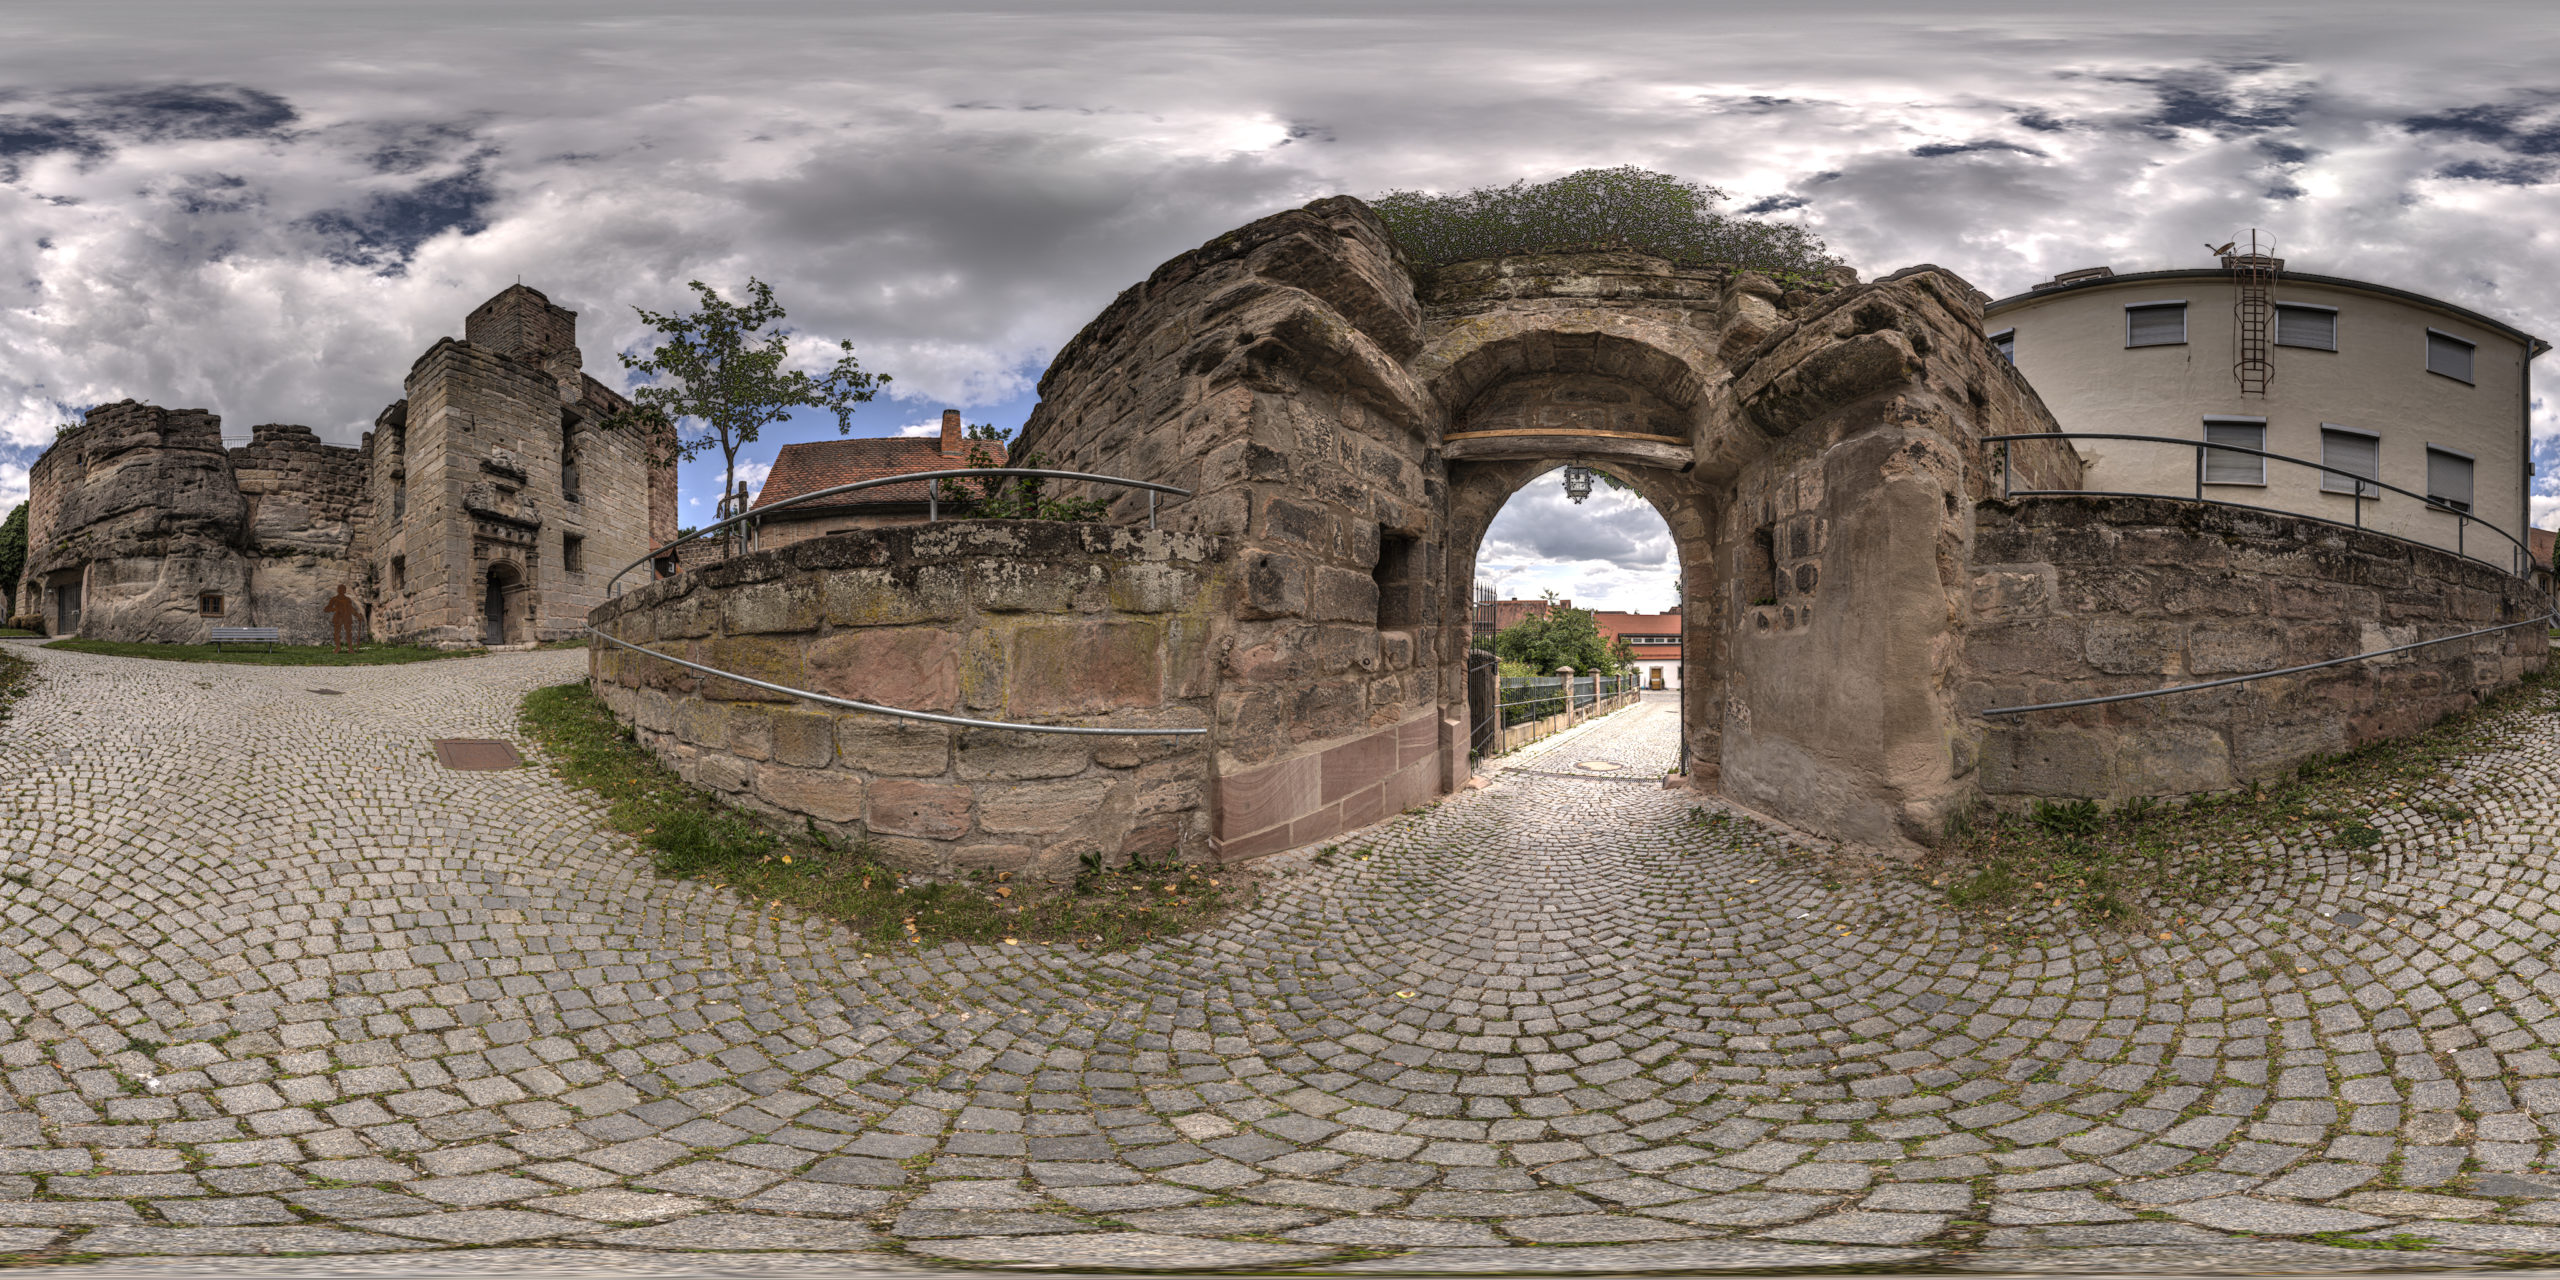 HDRI-Skies-Castle-Yard-Hilpoltstein